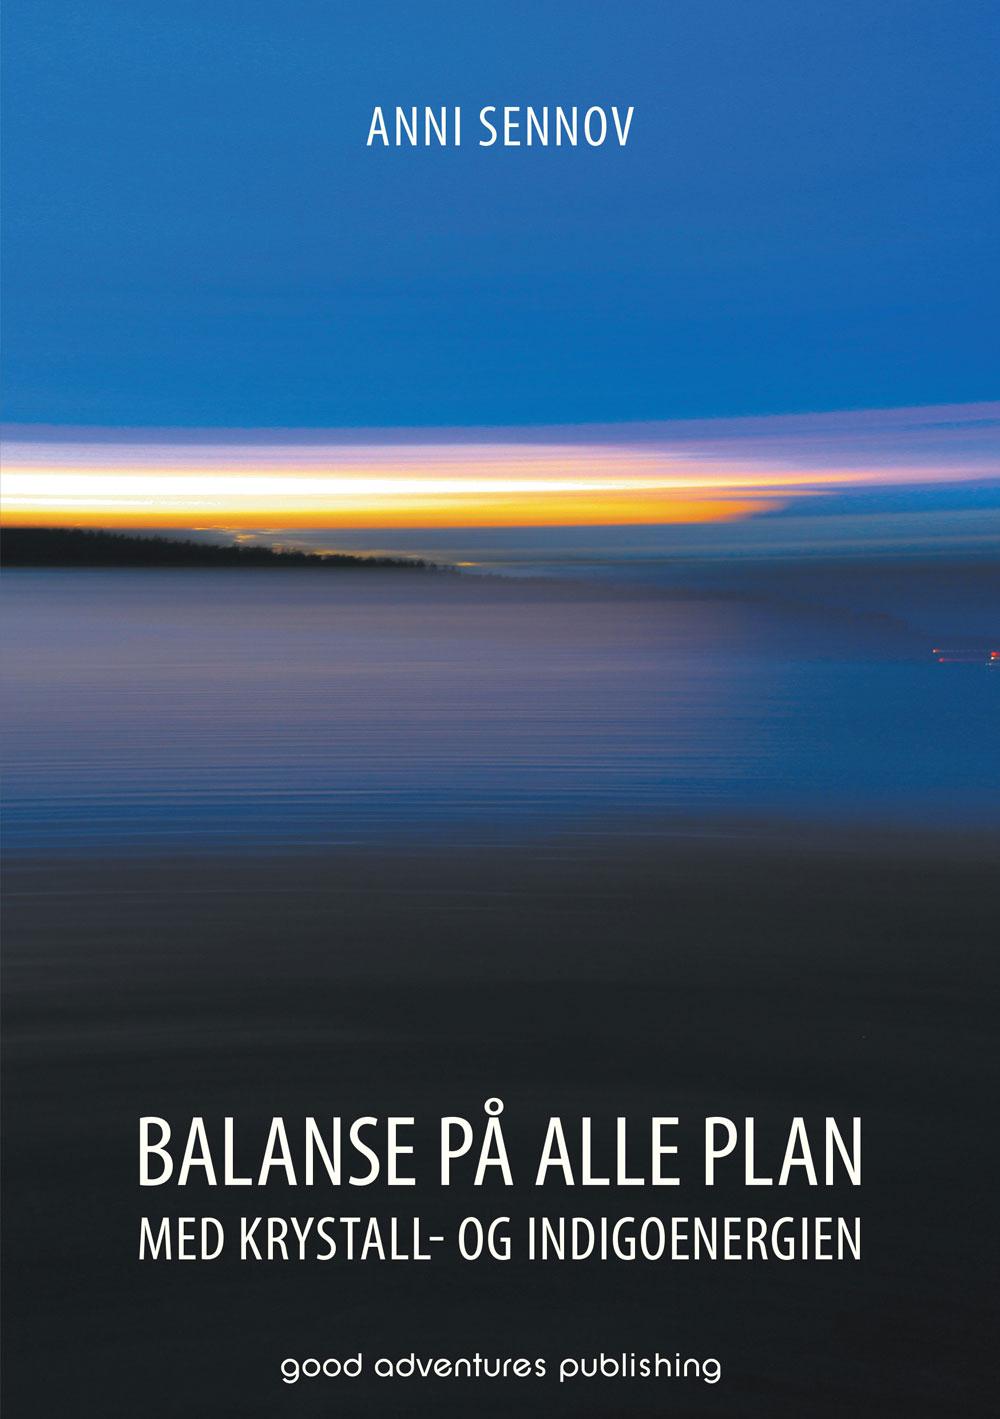 - BALANSE PÅ ALLE PLAN MED KRYSTALL OG INDIGOENERGIENAnni Sennov215 sider (NORSK)Pris: NOK 270,00